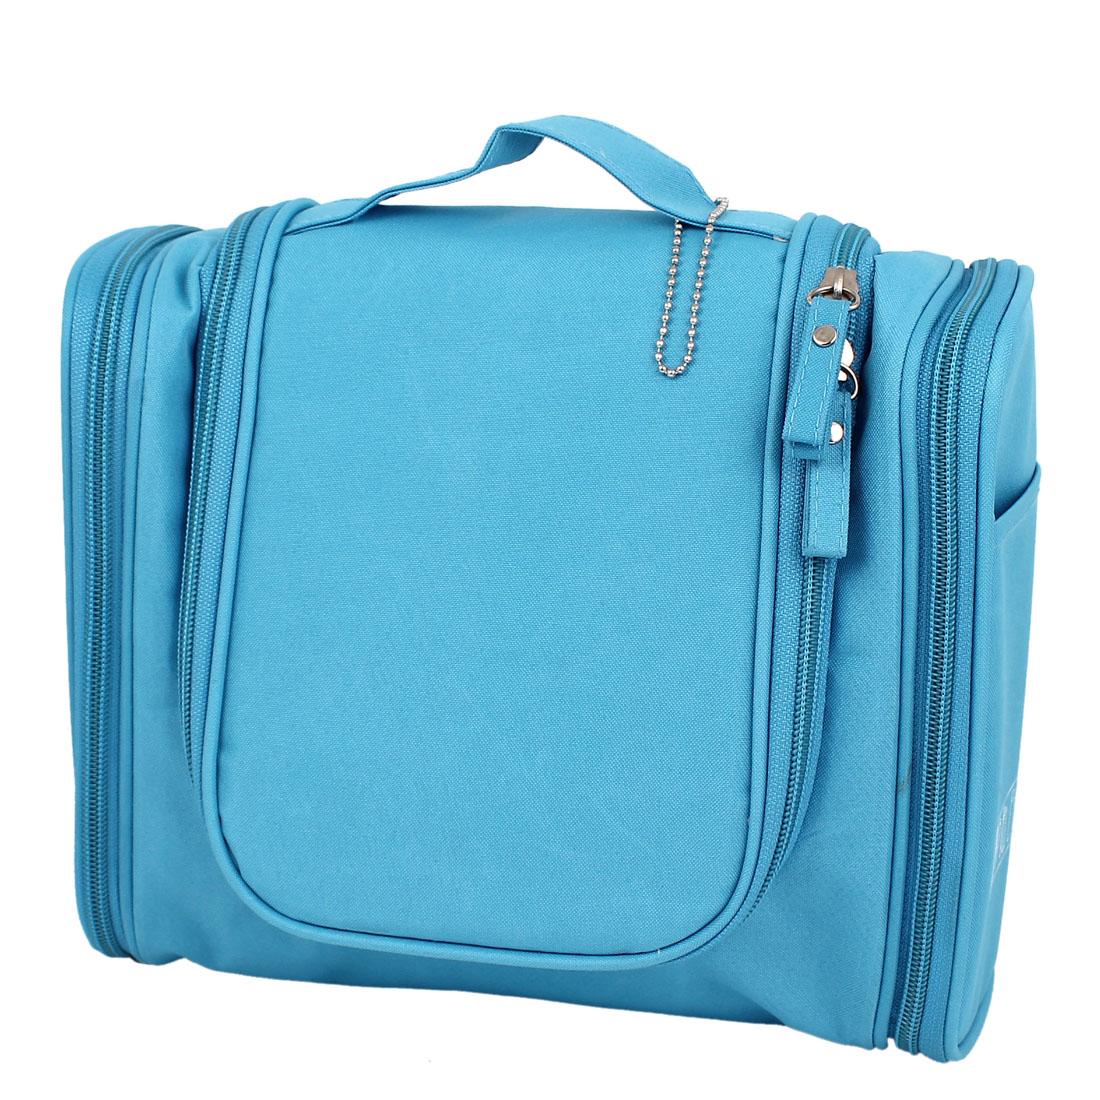 Lady Travel Cosmetic Toiletry Toiletries Hanging Storage Wash Bag Handbag Blue